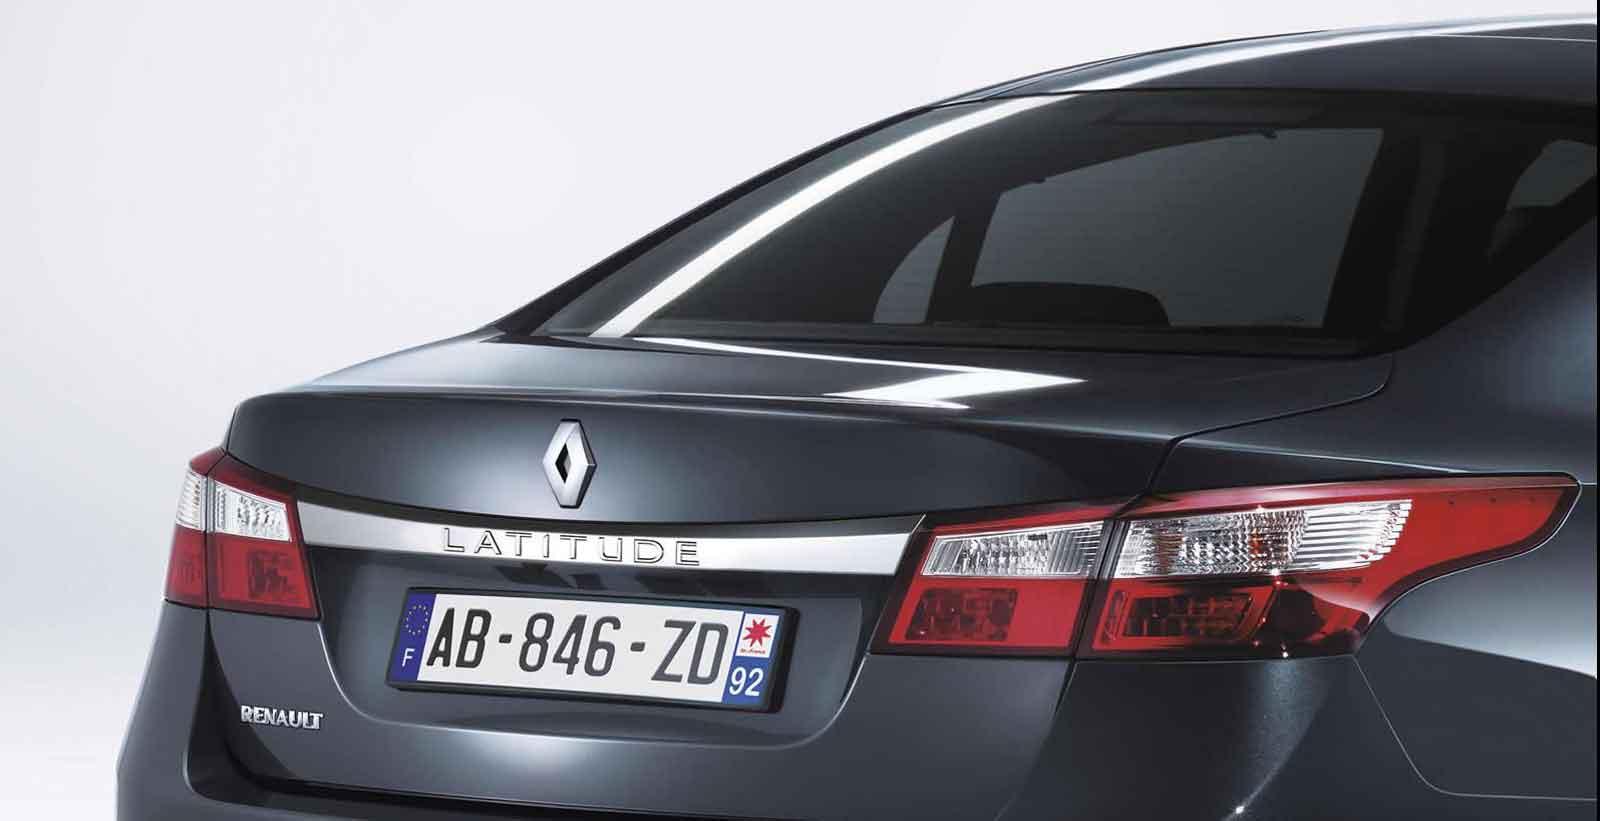 Renault Латитьюд 2014 фото